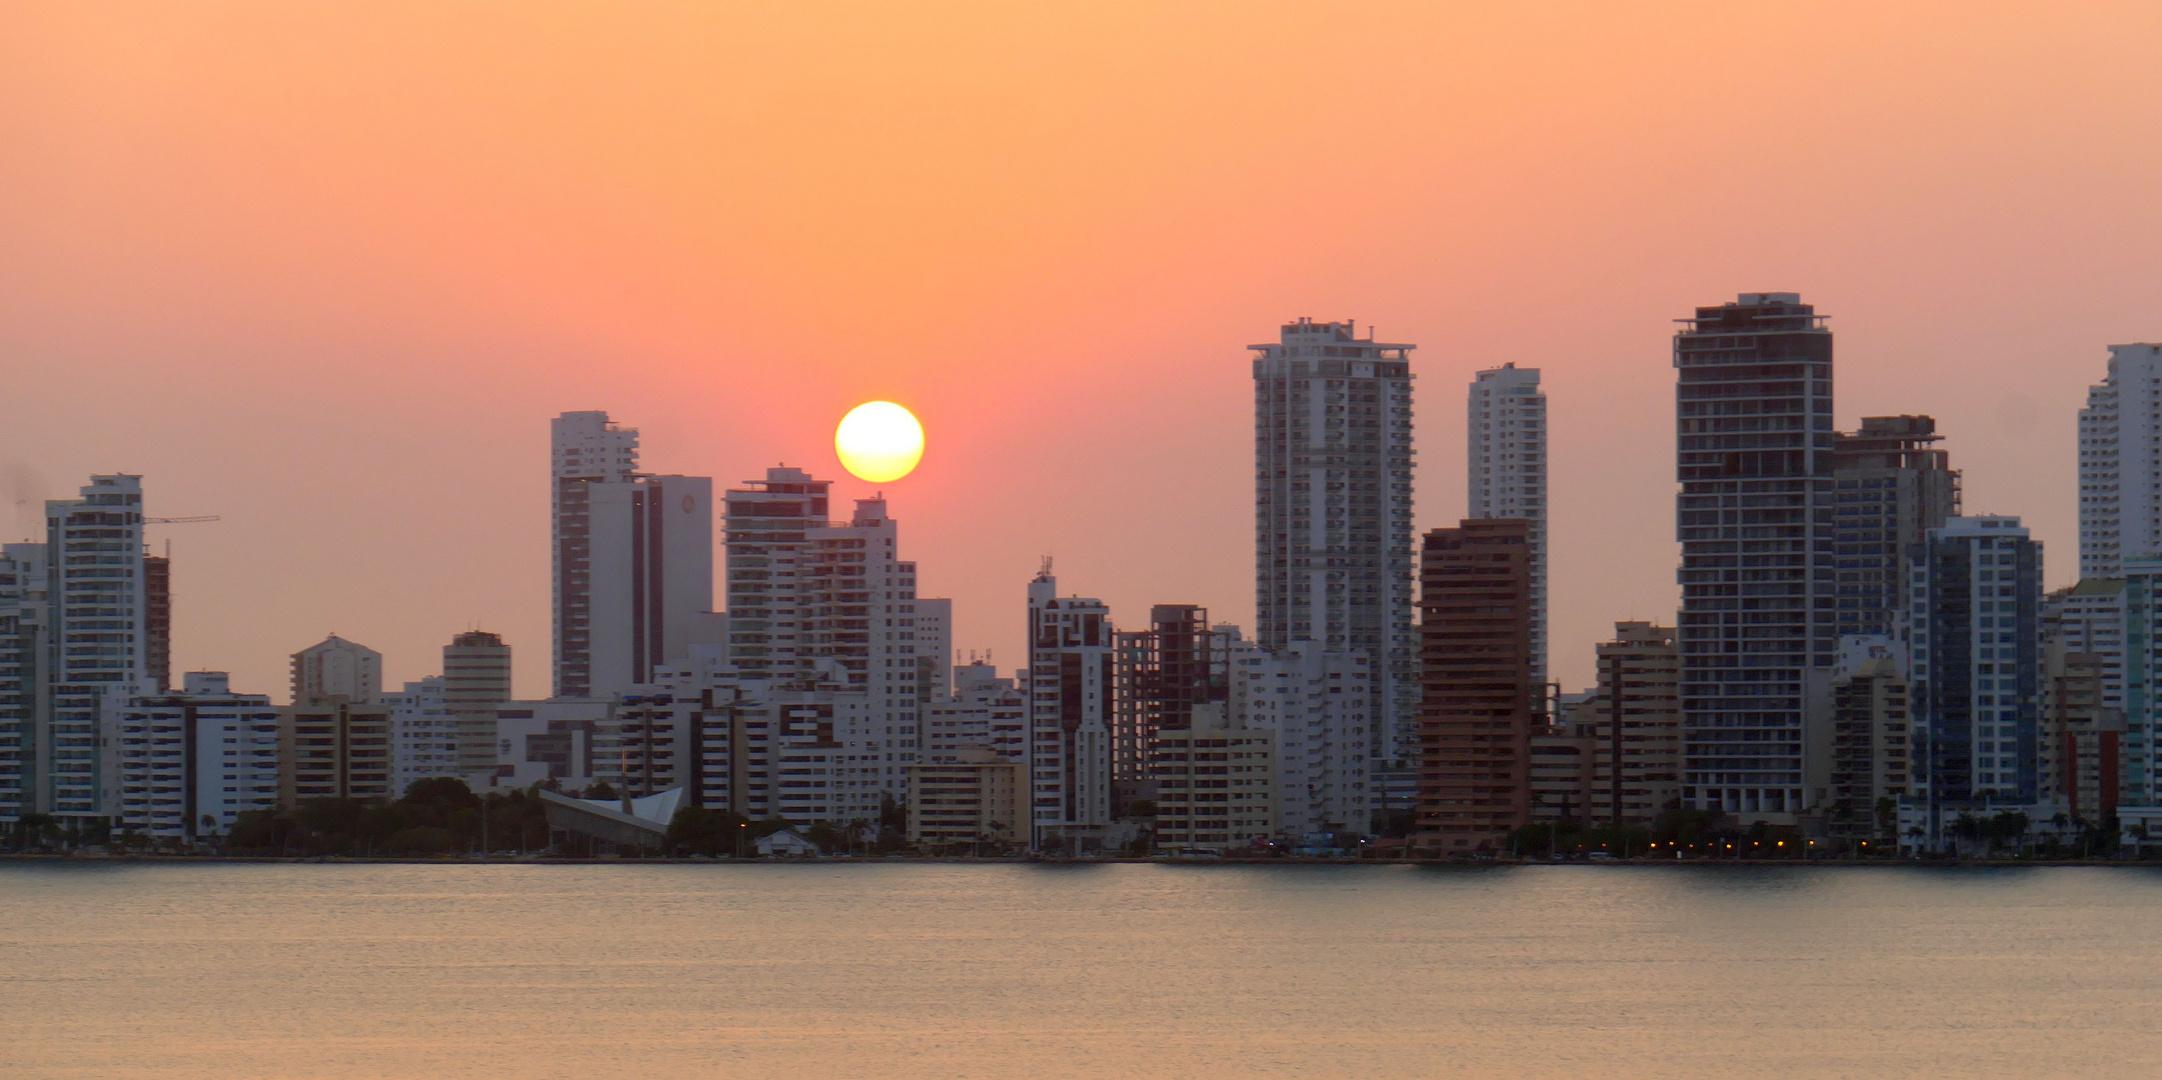 Kreuzfahrt_Kolumbien-Cartagena-Sonnenuntergang_02_2020